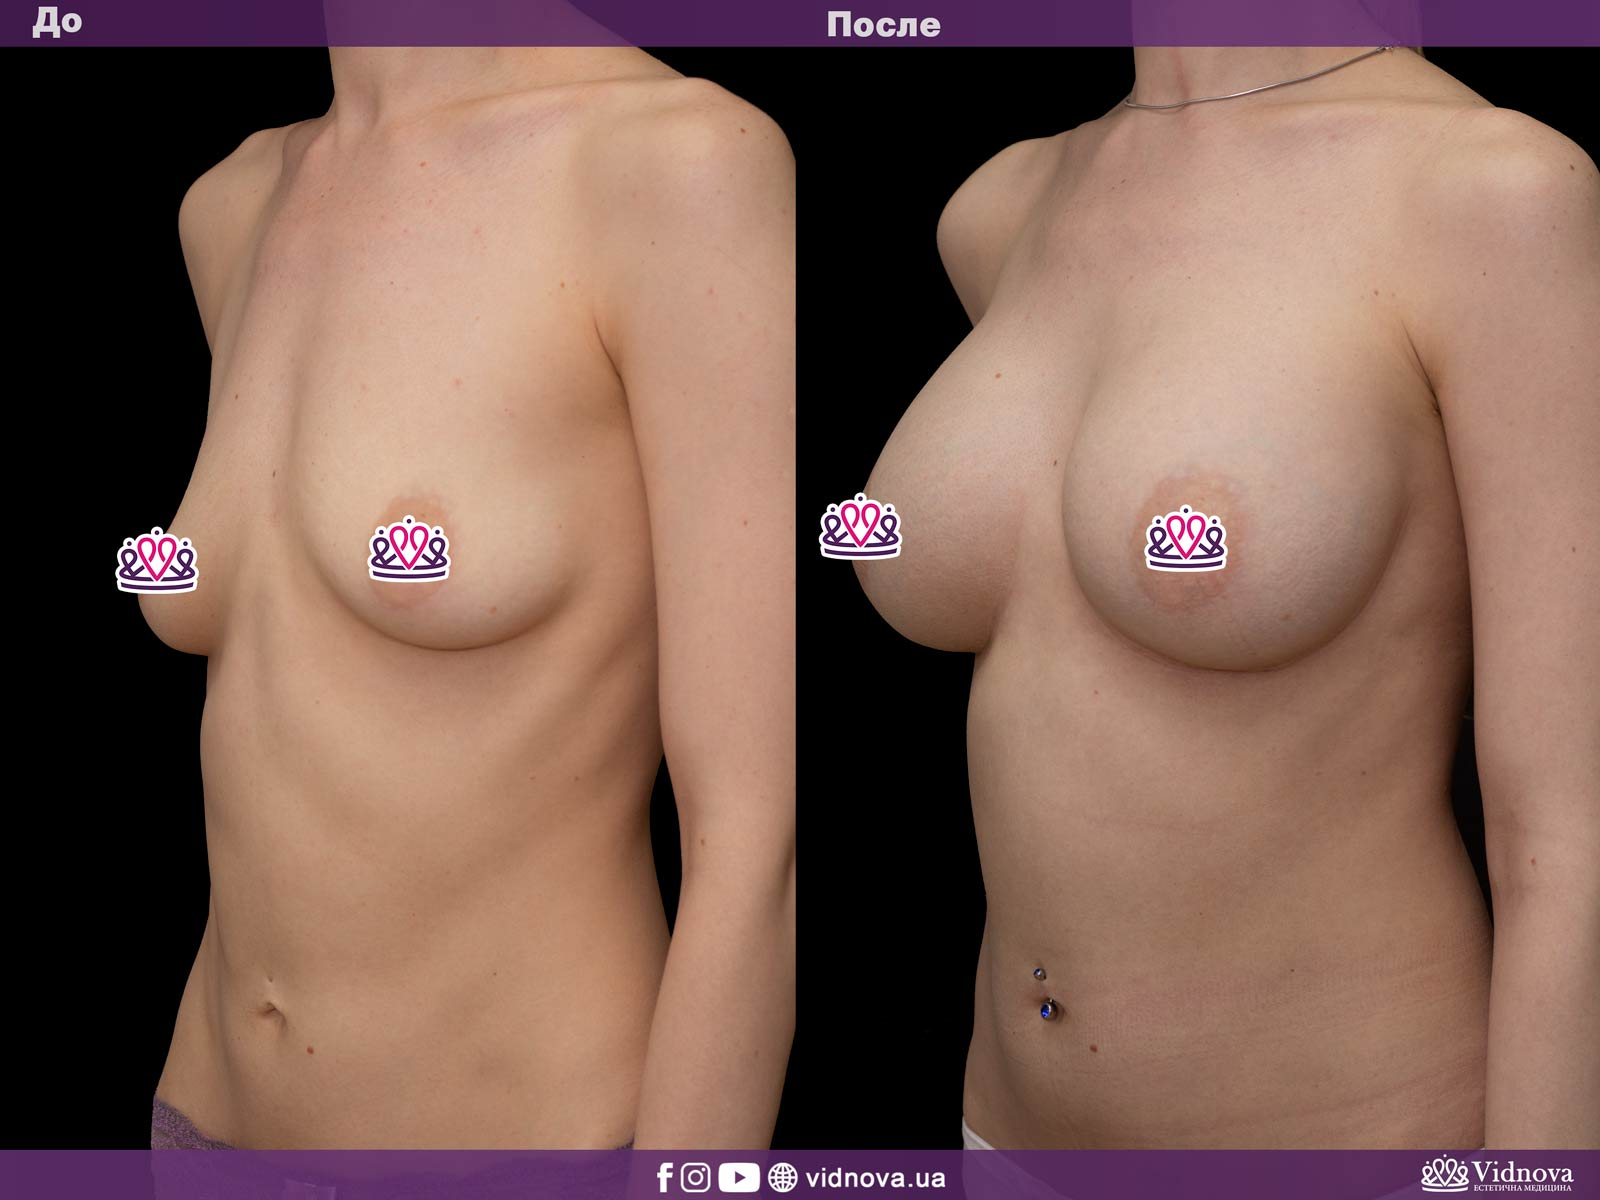 Увеличение груди: Фото ДО и ПОСЛЕ - Пример №11-2 - Клиника Vidnova